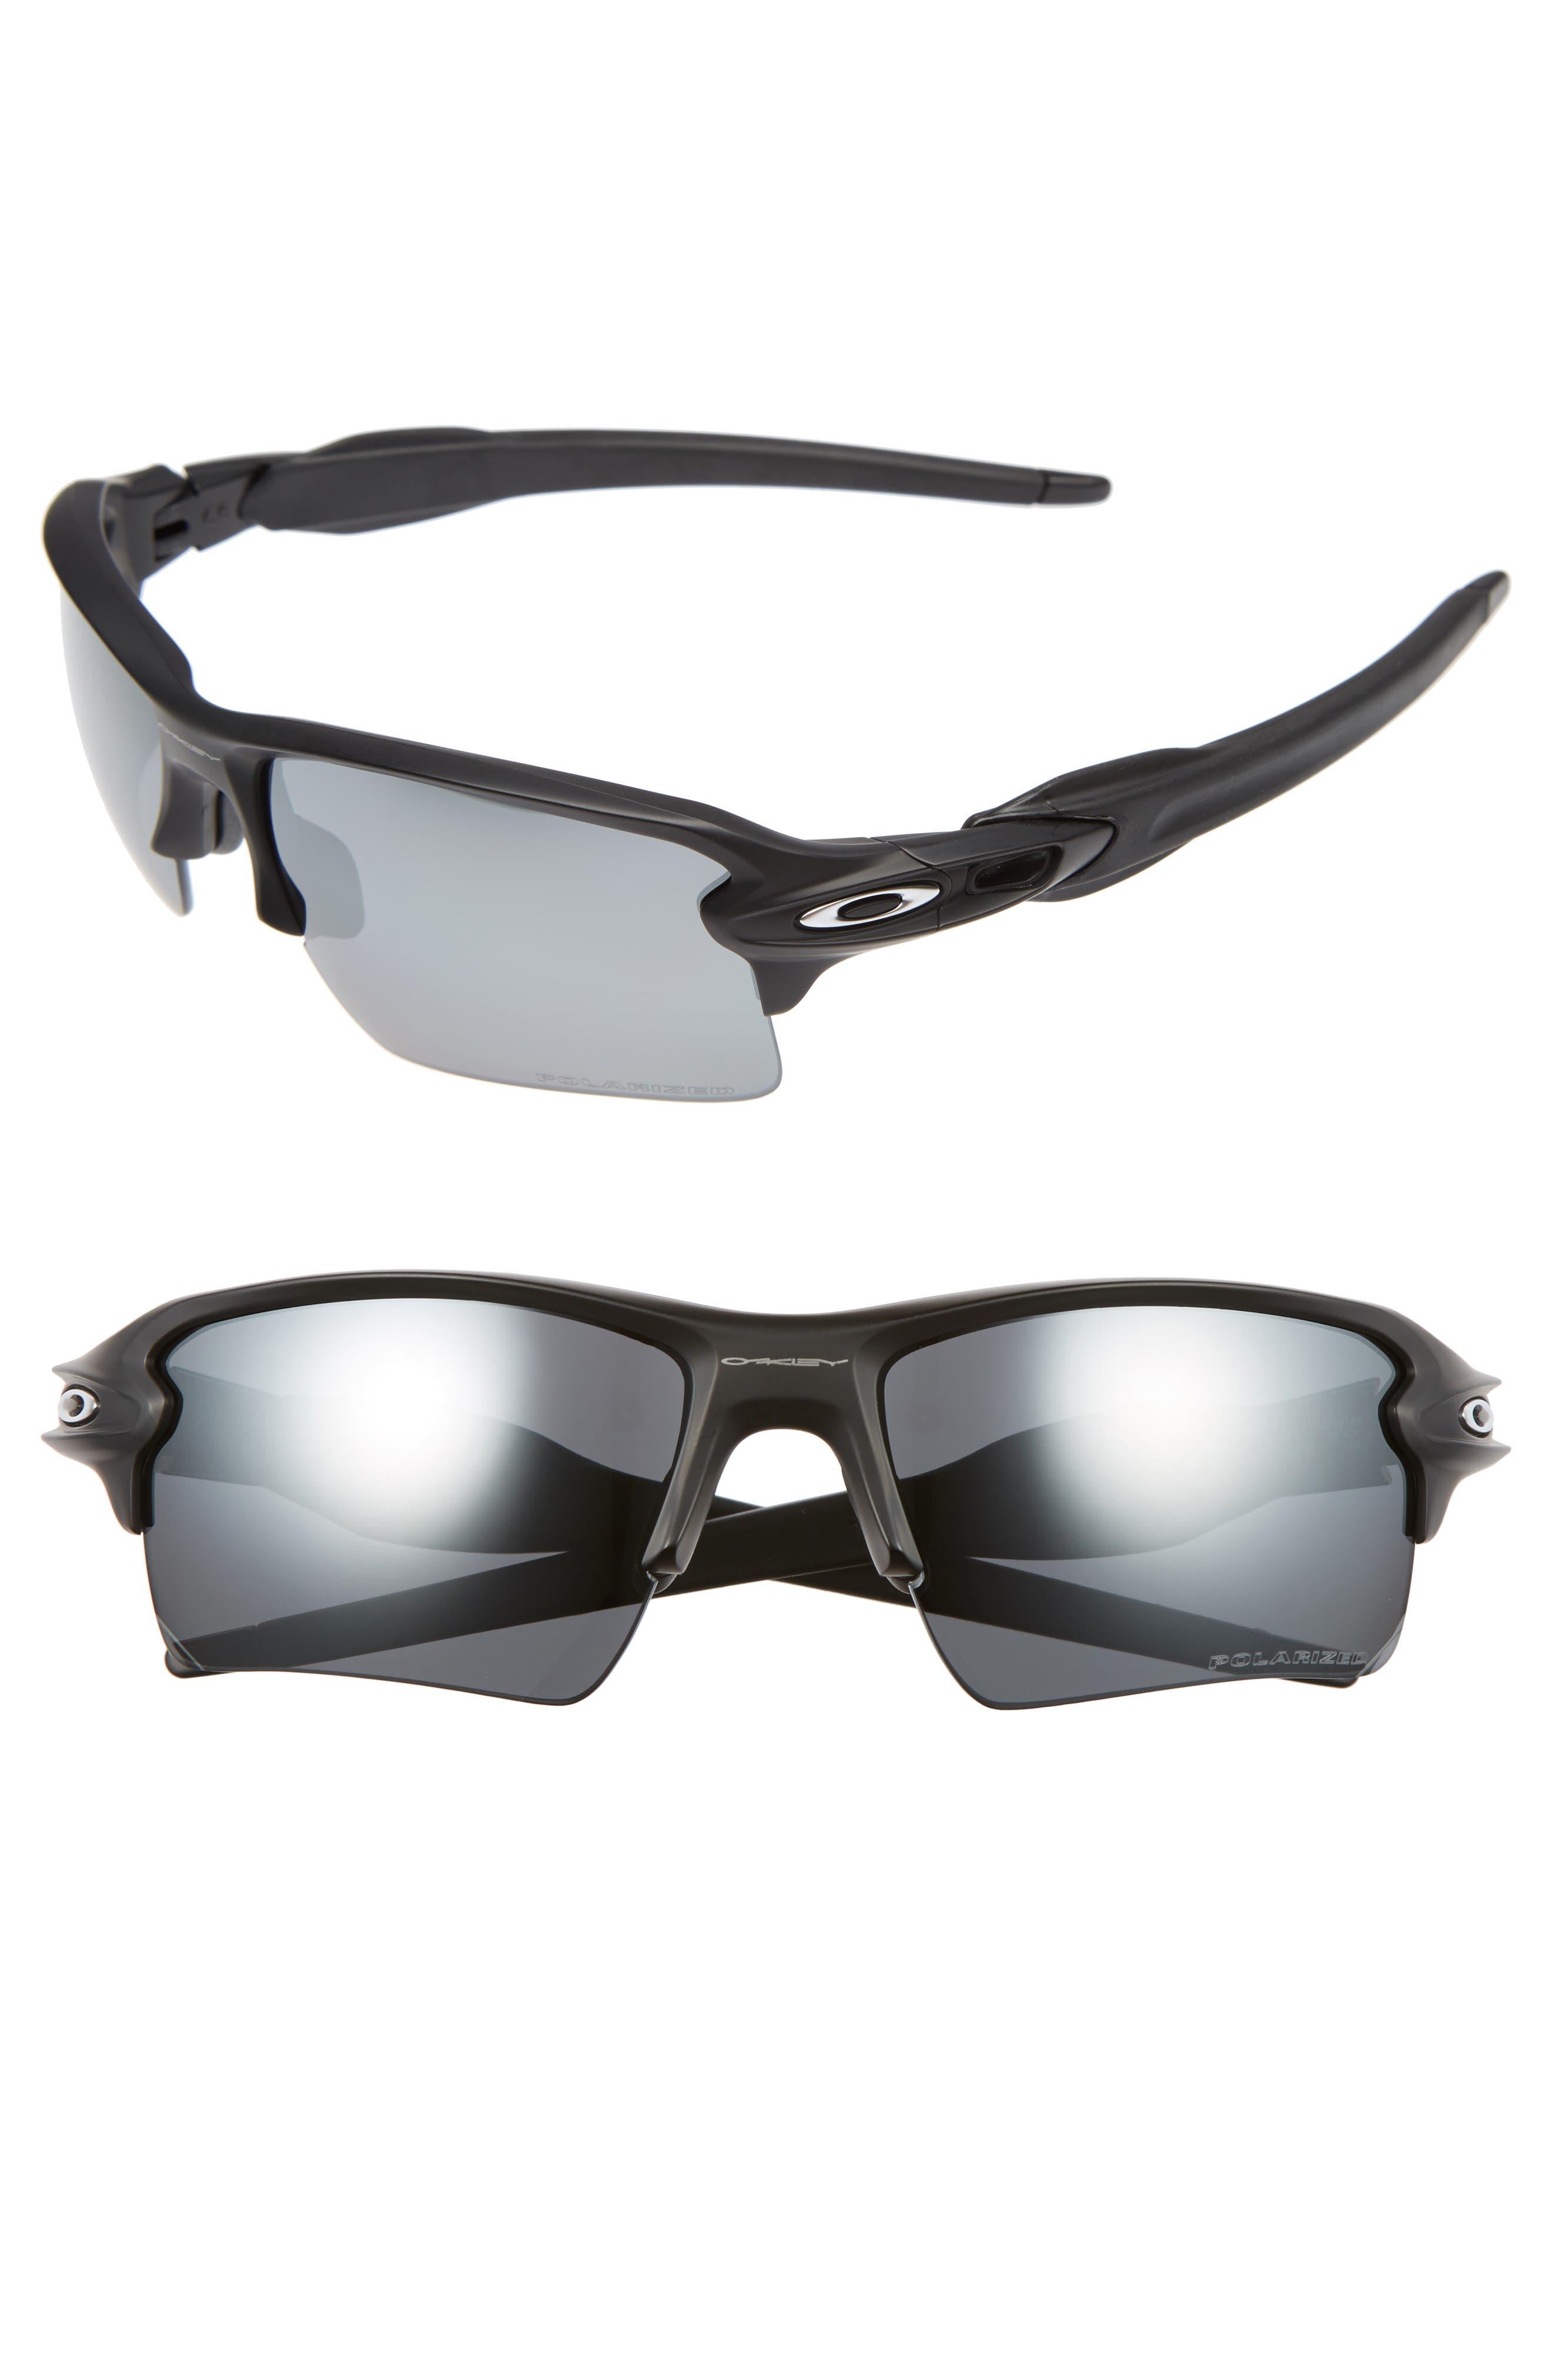 Flak 2.0 XL 59mm Polarized Sunglasses,                             Main thumbnail 1, color,                             001